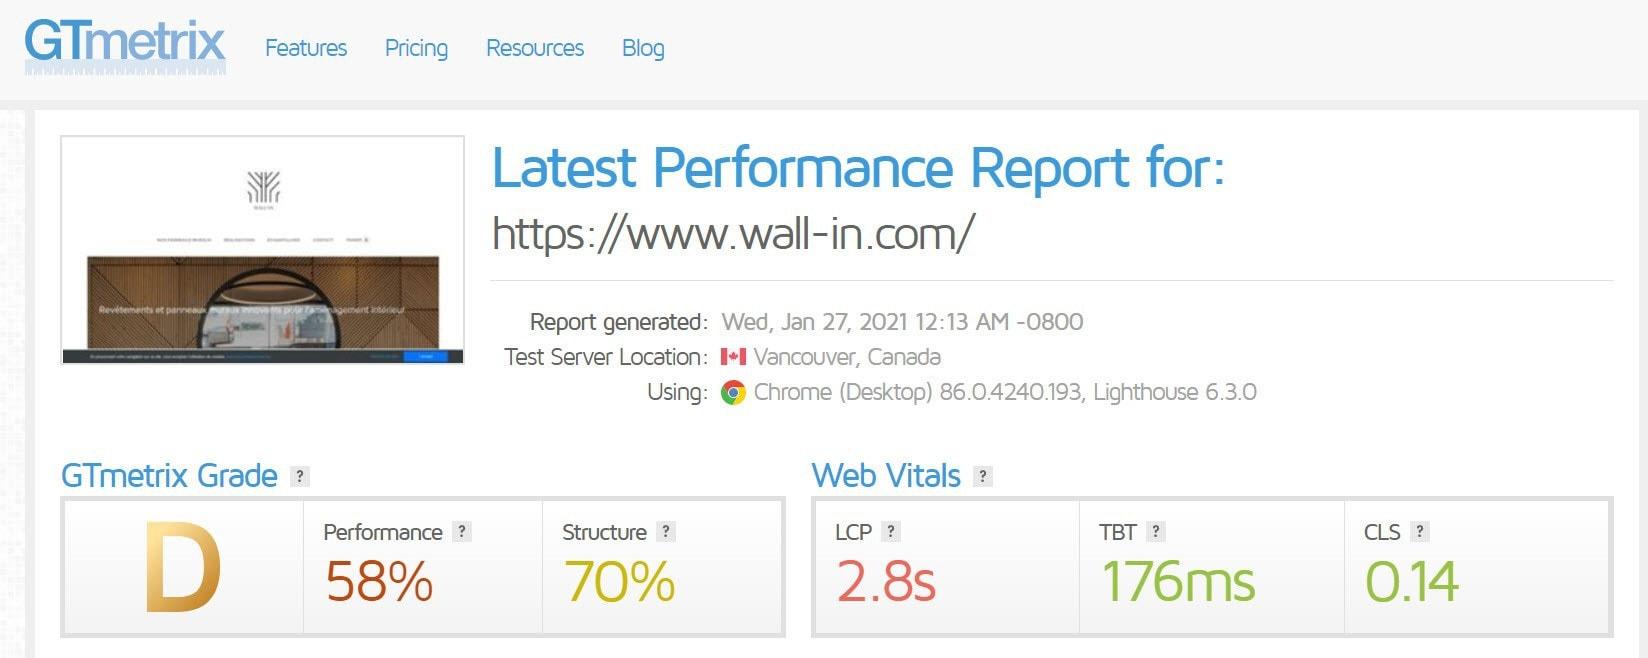 wall-in.com GTmetrix score